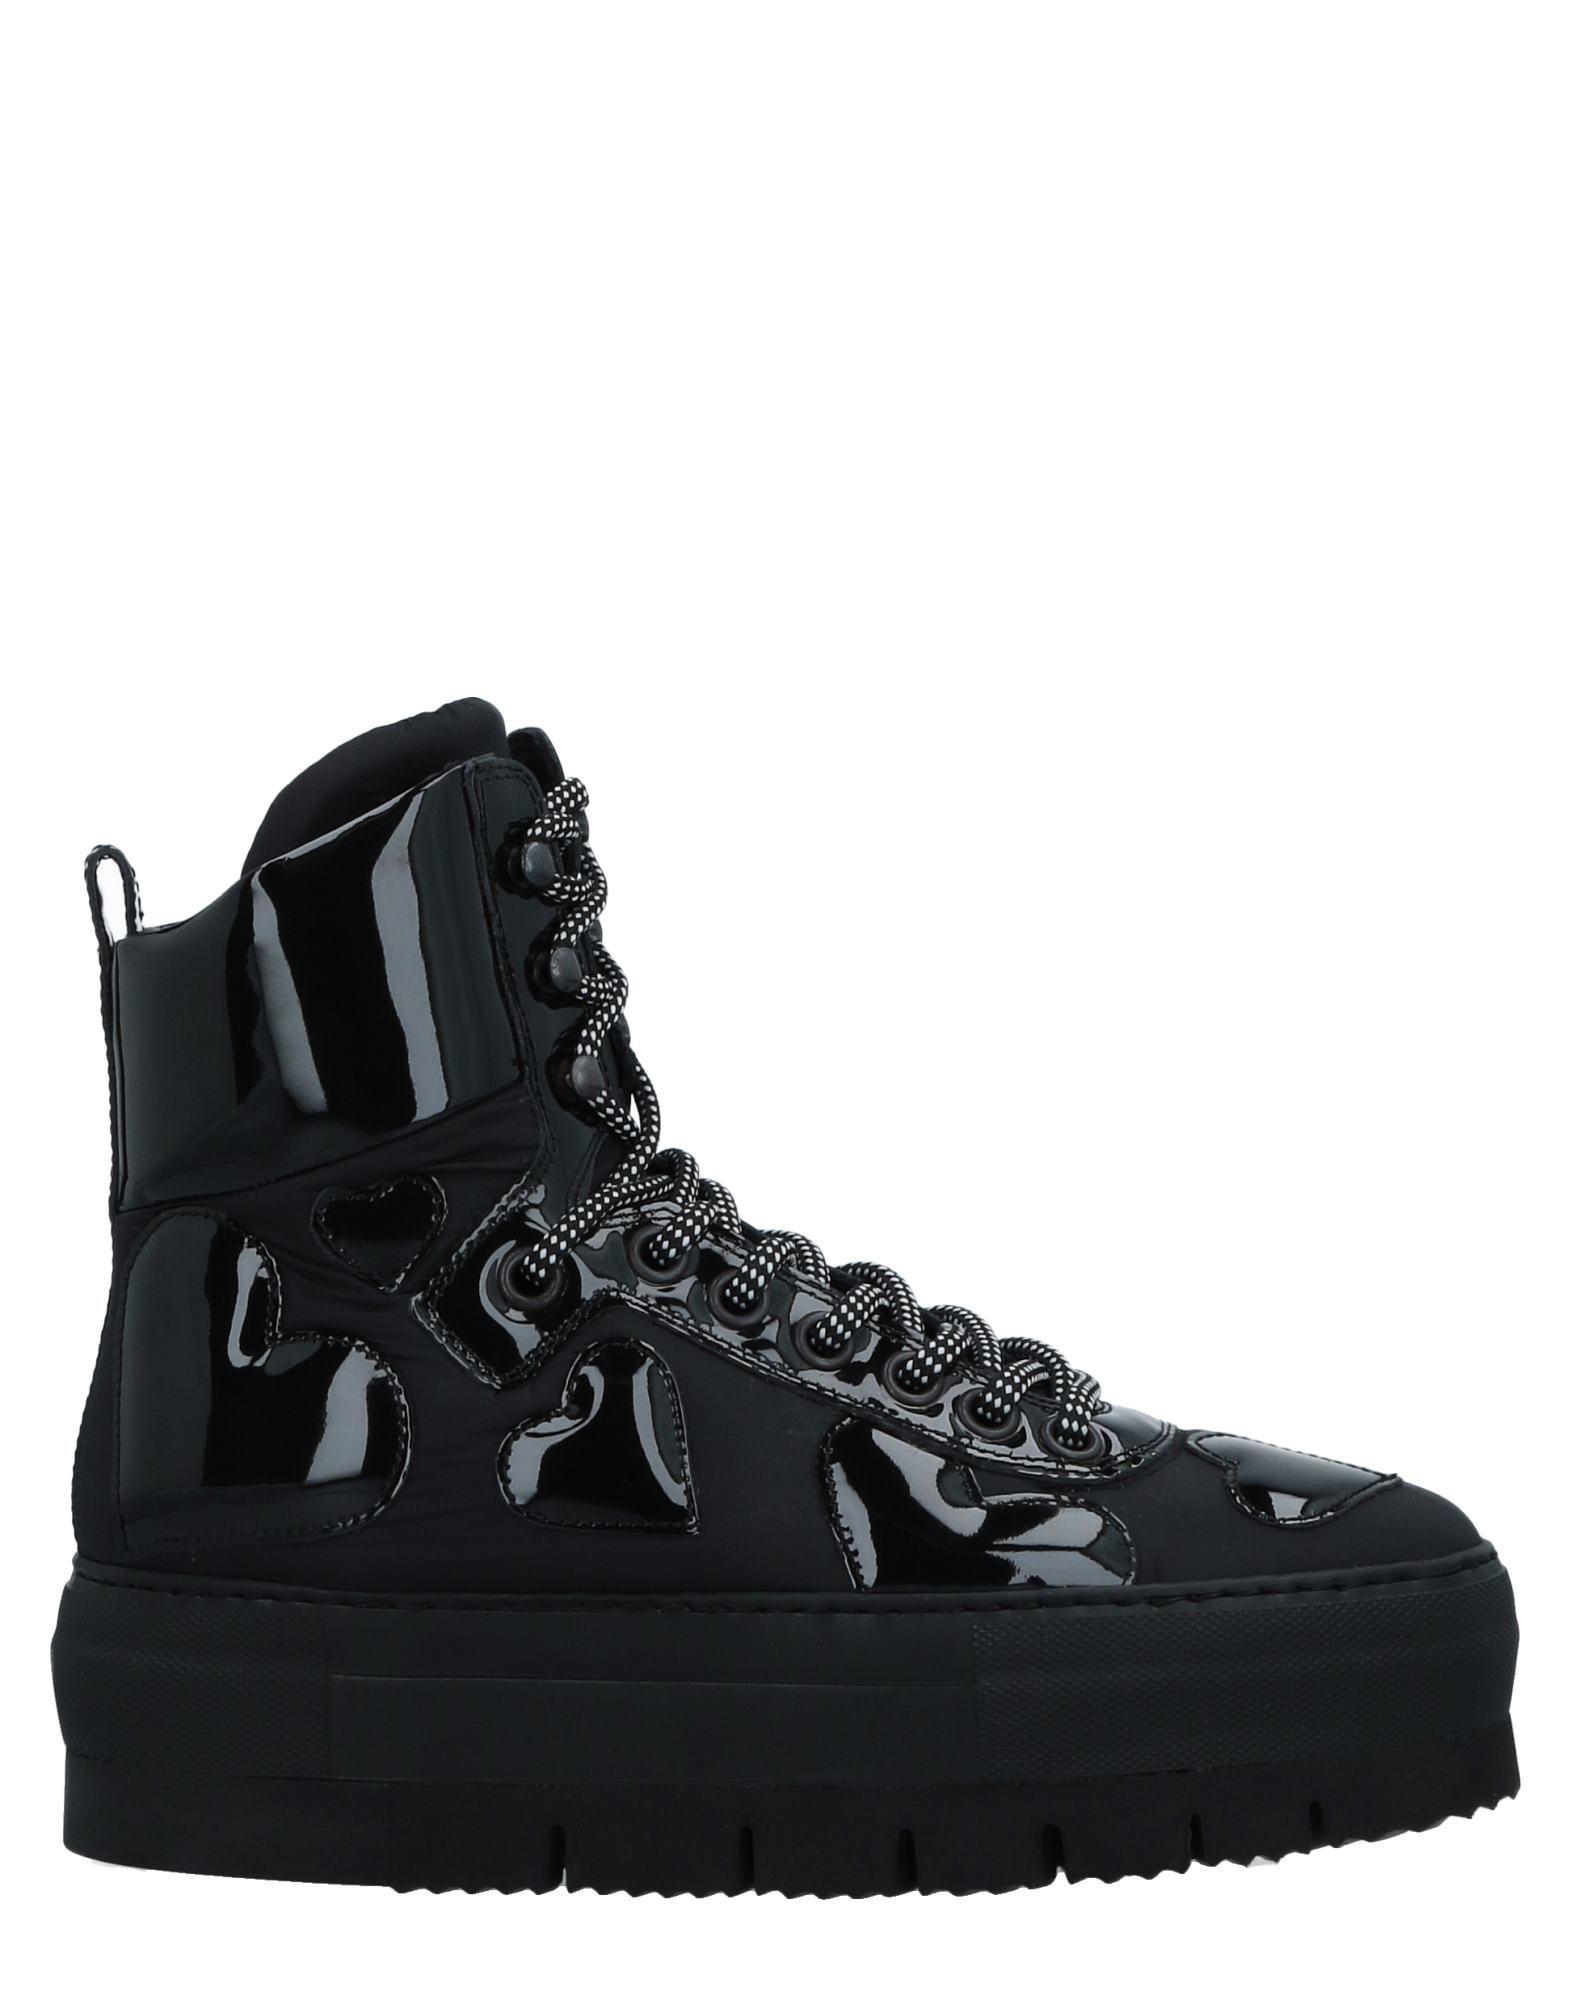 Rabatt Schuhe Philippe Model Stiefelette Damen  11515805FI